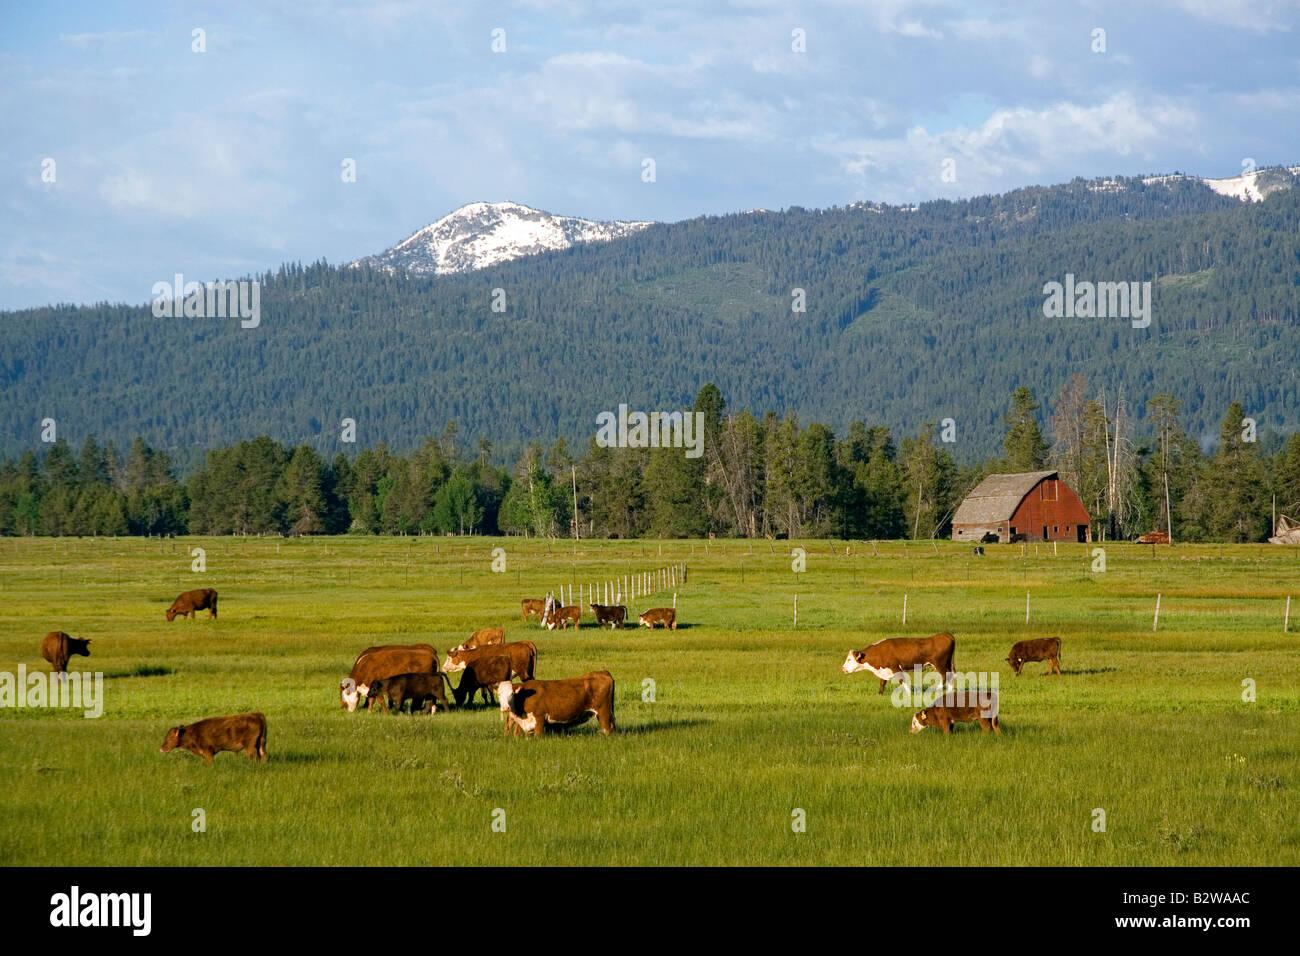 Cattle graze in a pasture near Cascade Idaho - Stock Image